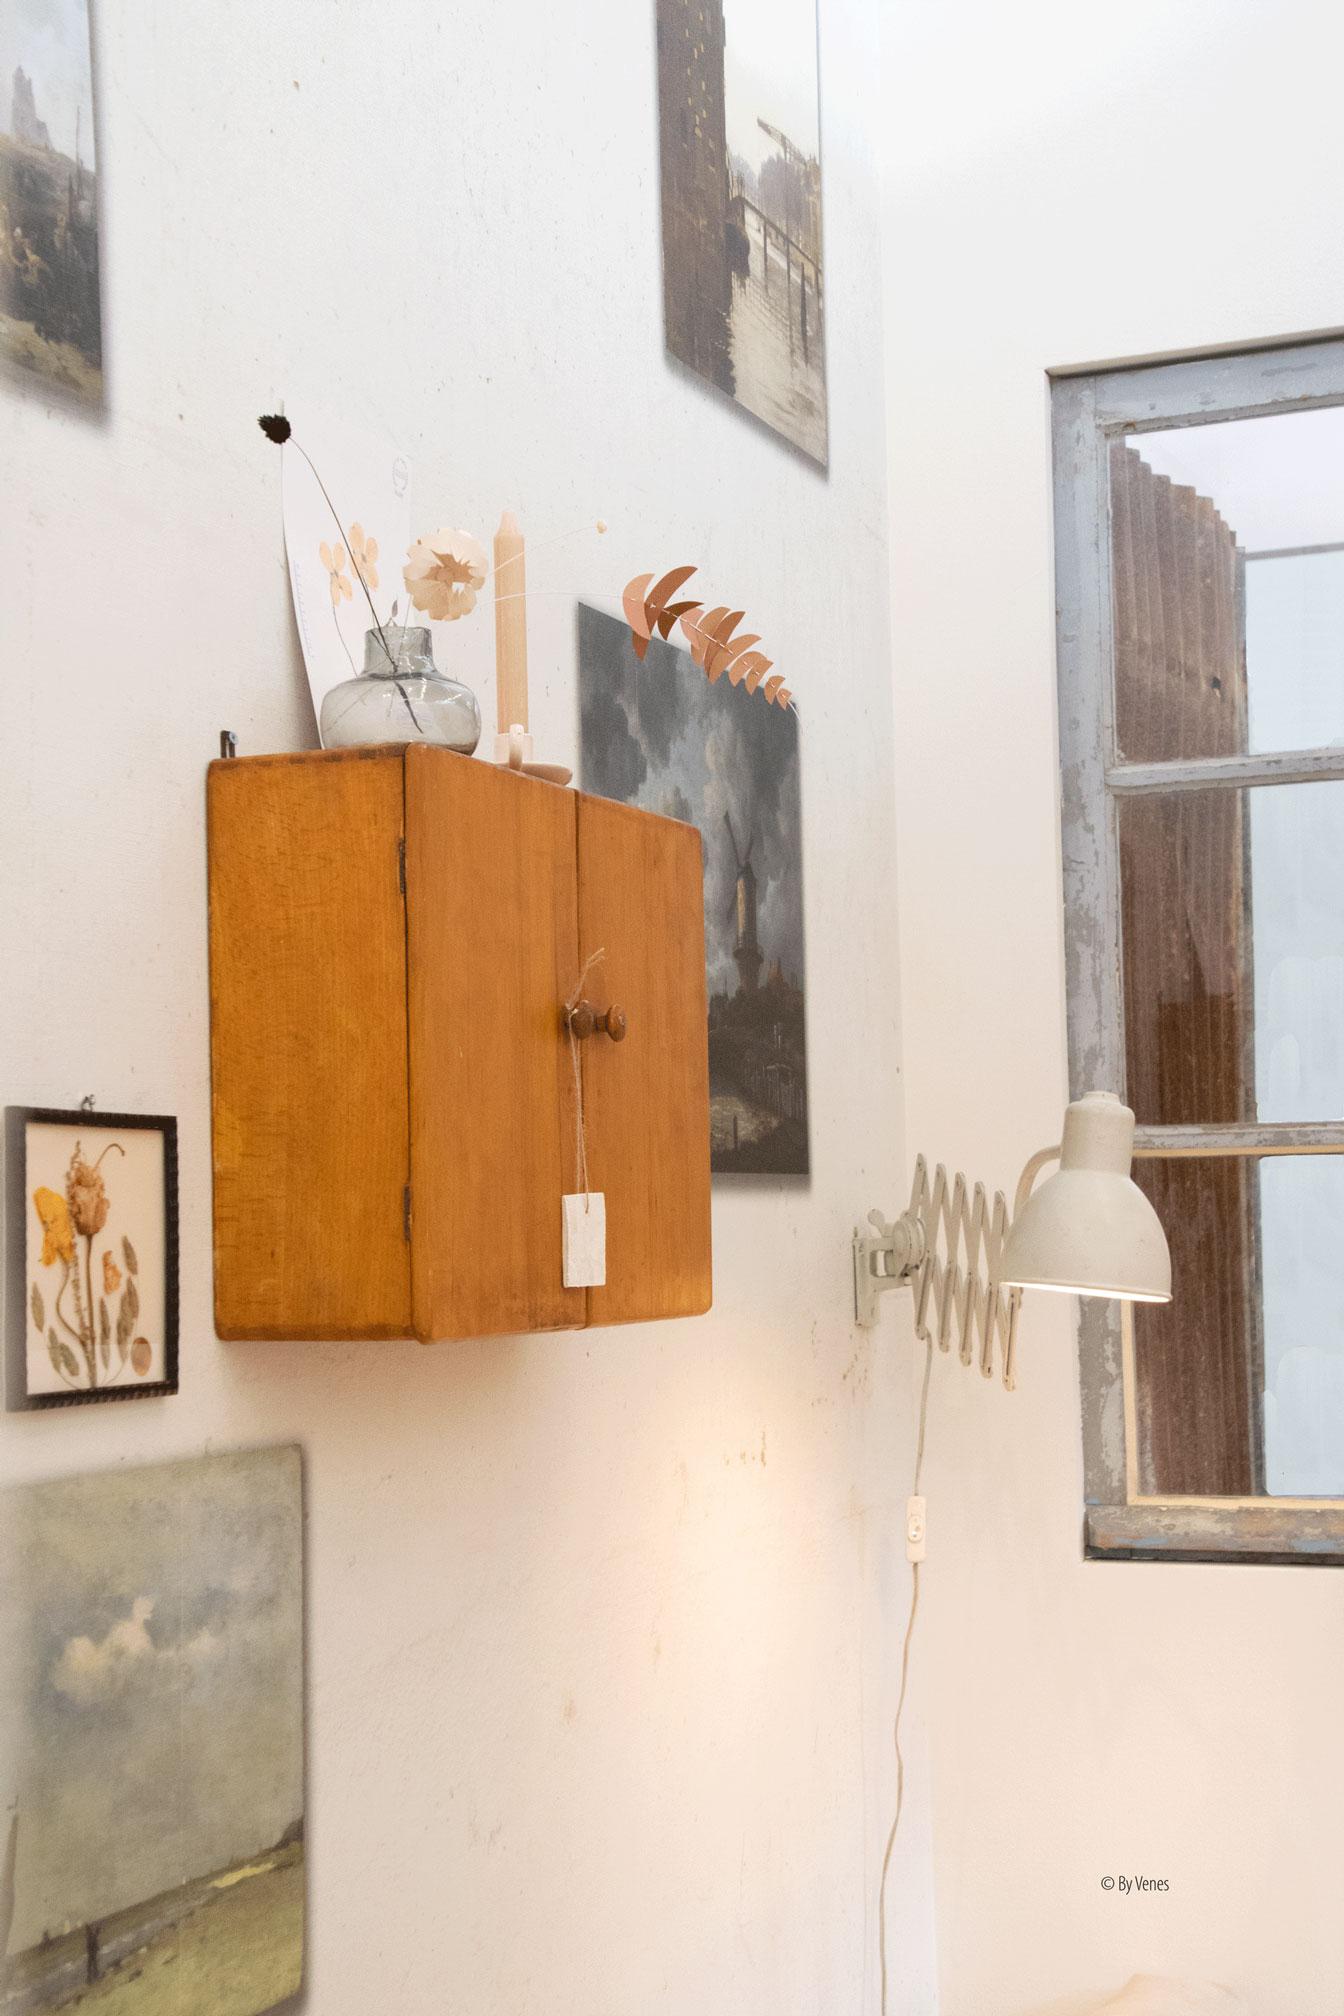 Wandkastje wandlamp Jolandelijk Ariadne at Home 2019